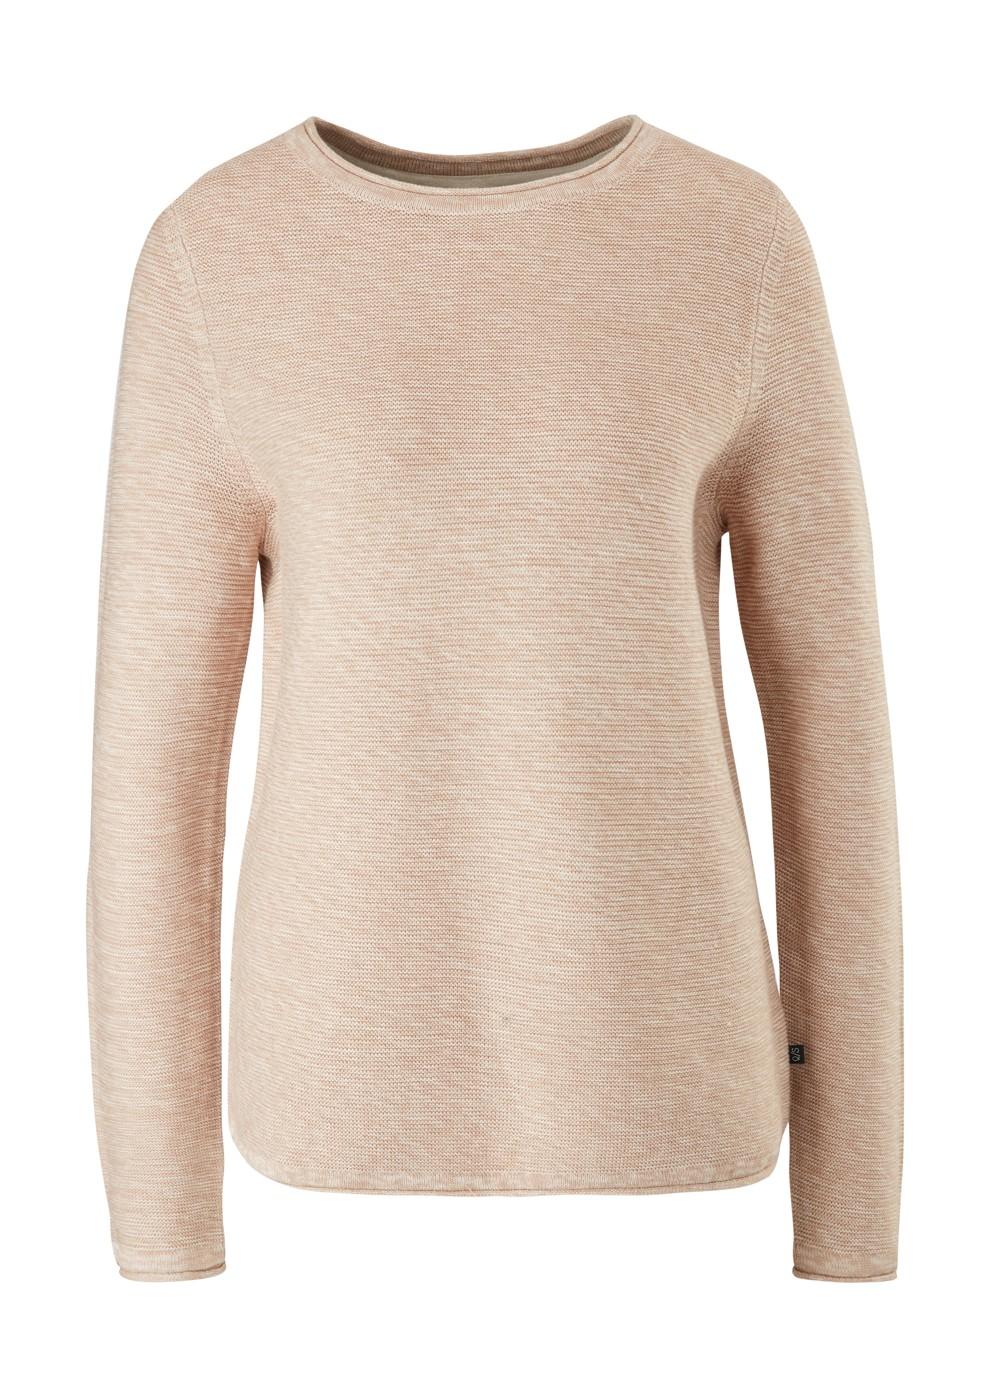 510 Pullover langarm - Damen